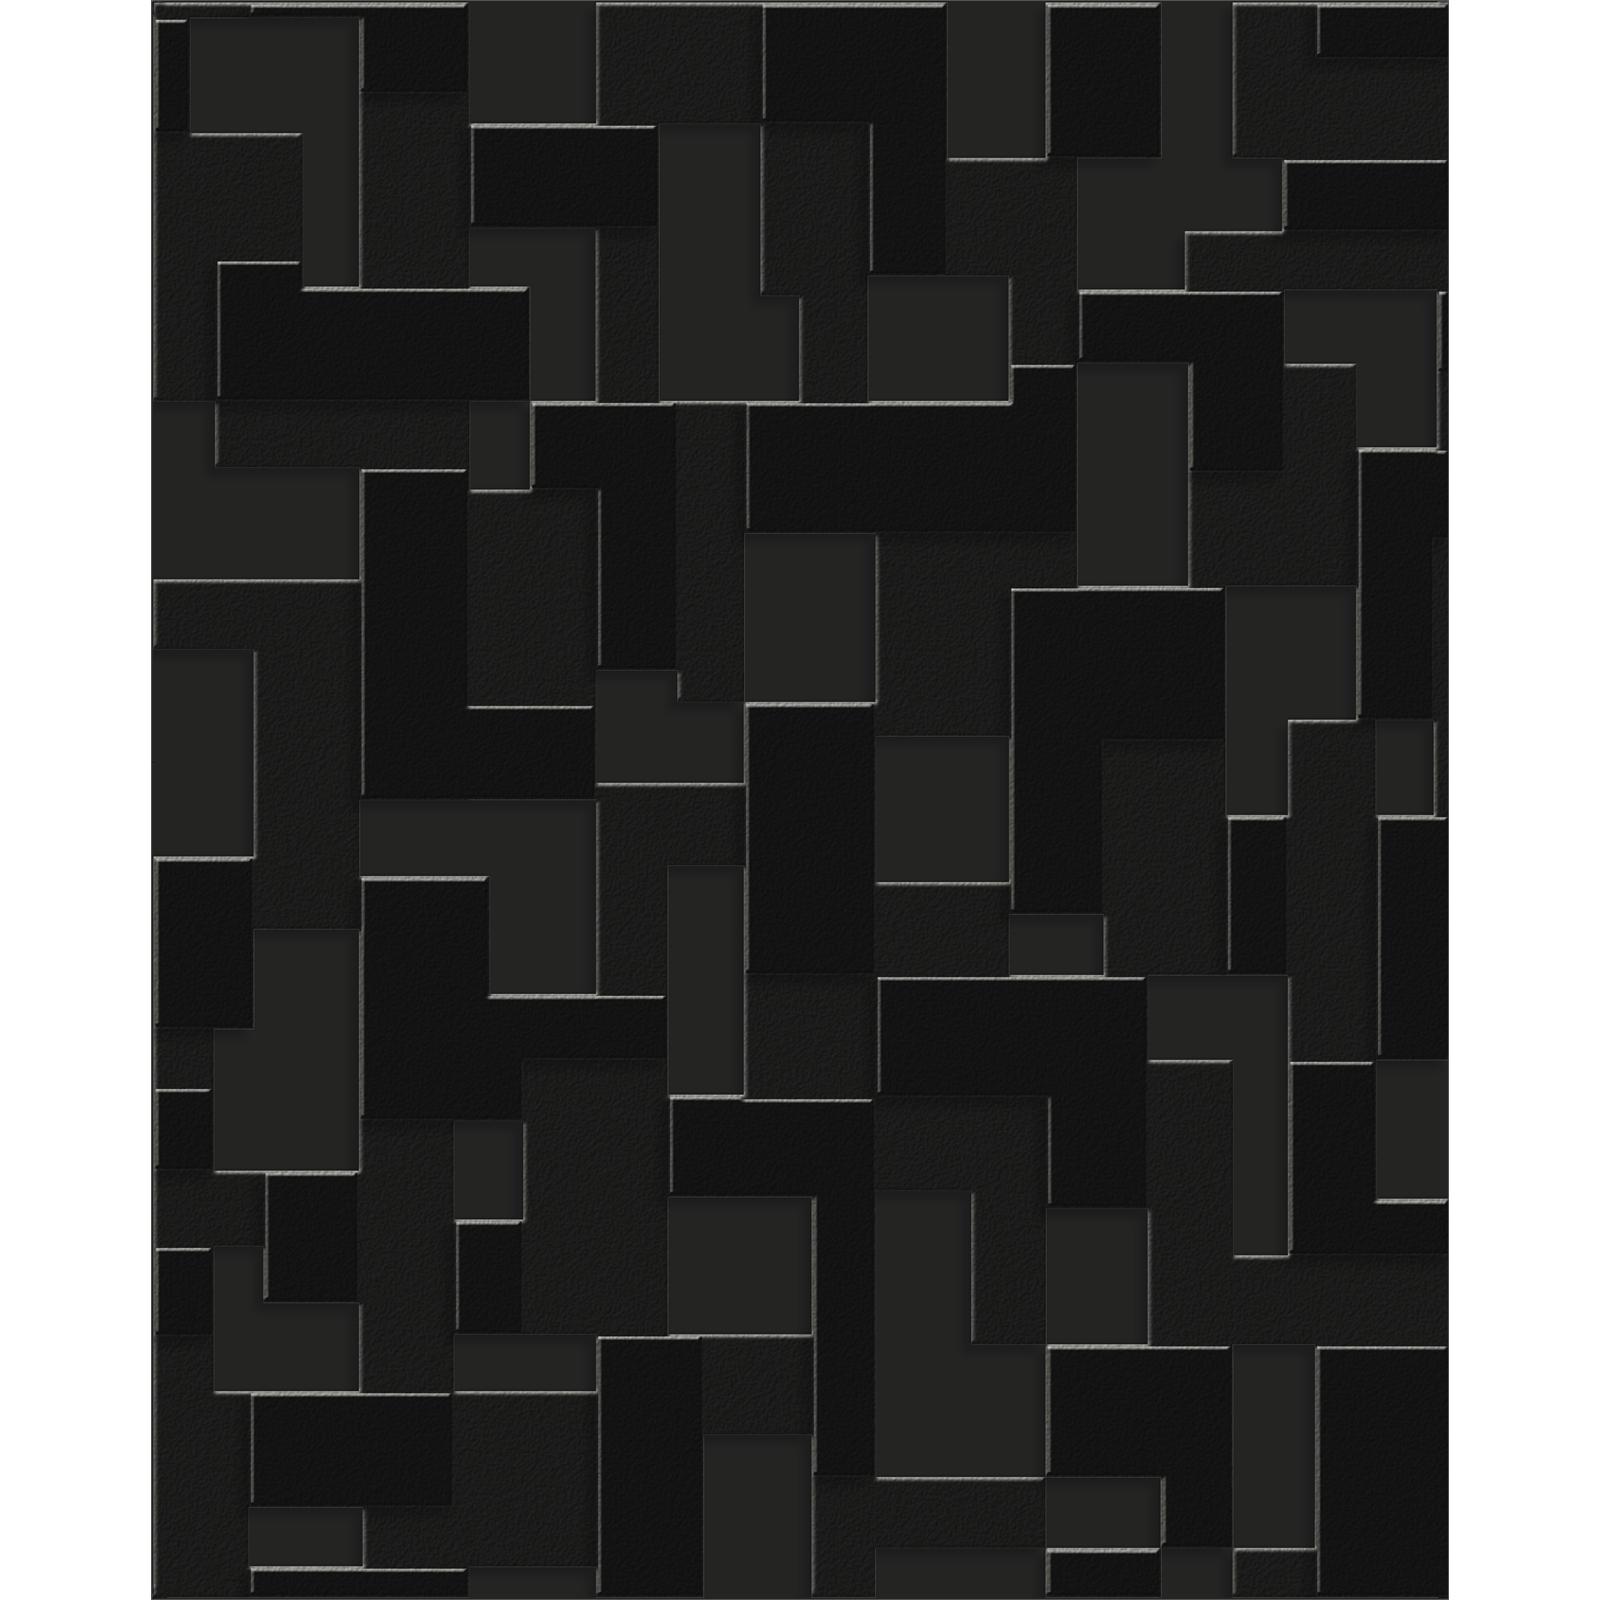 Superfresco Easy Black Checker Wallpaper - Black Checker 52cm x 10m